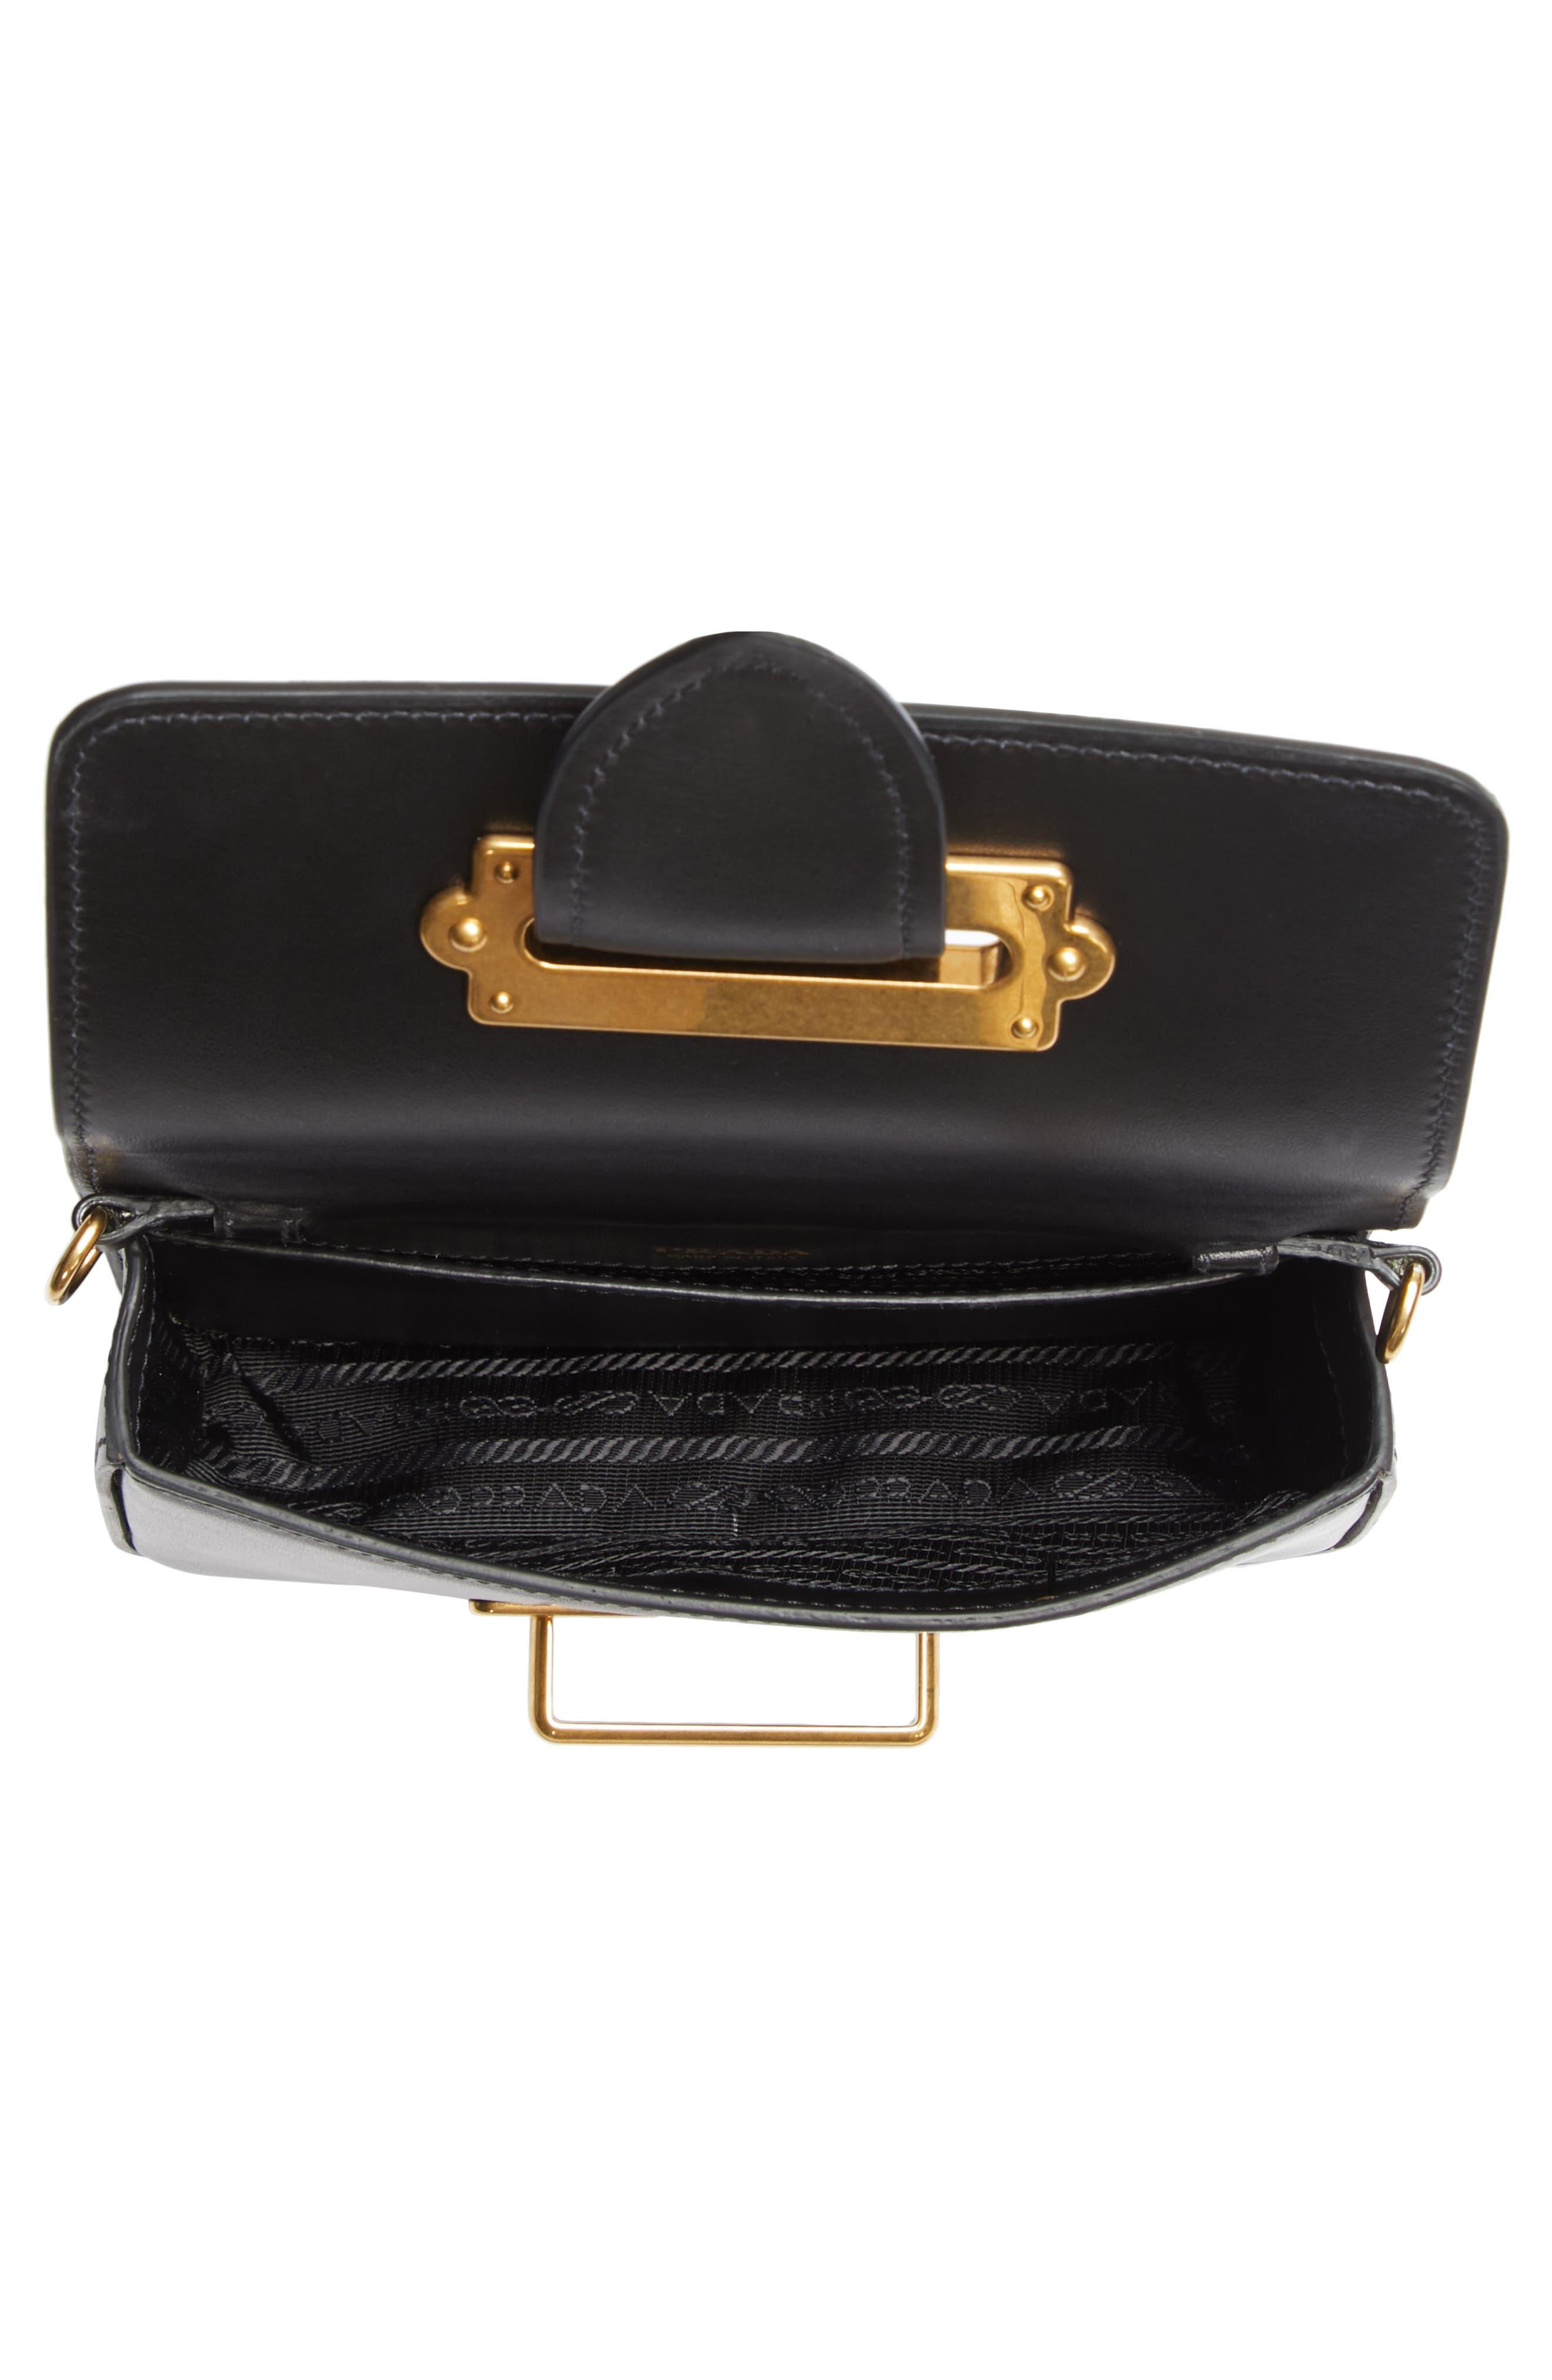 Cahier Calfskin Leather Convertible Belt Bag,                             Alternate thumbnail 4, color,                             001